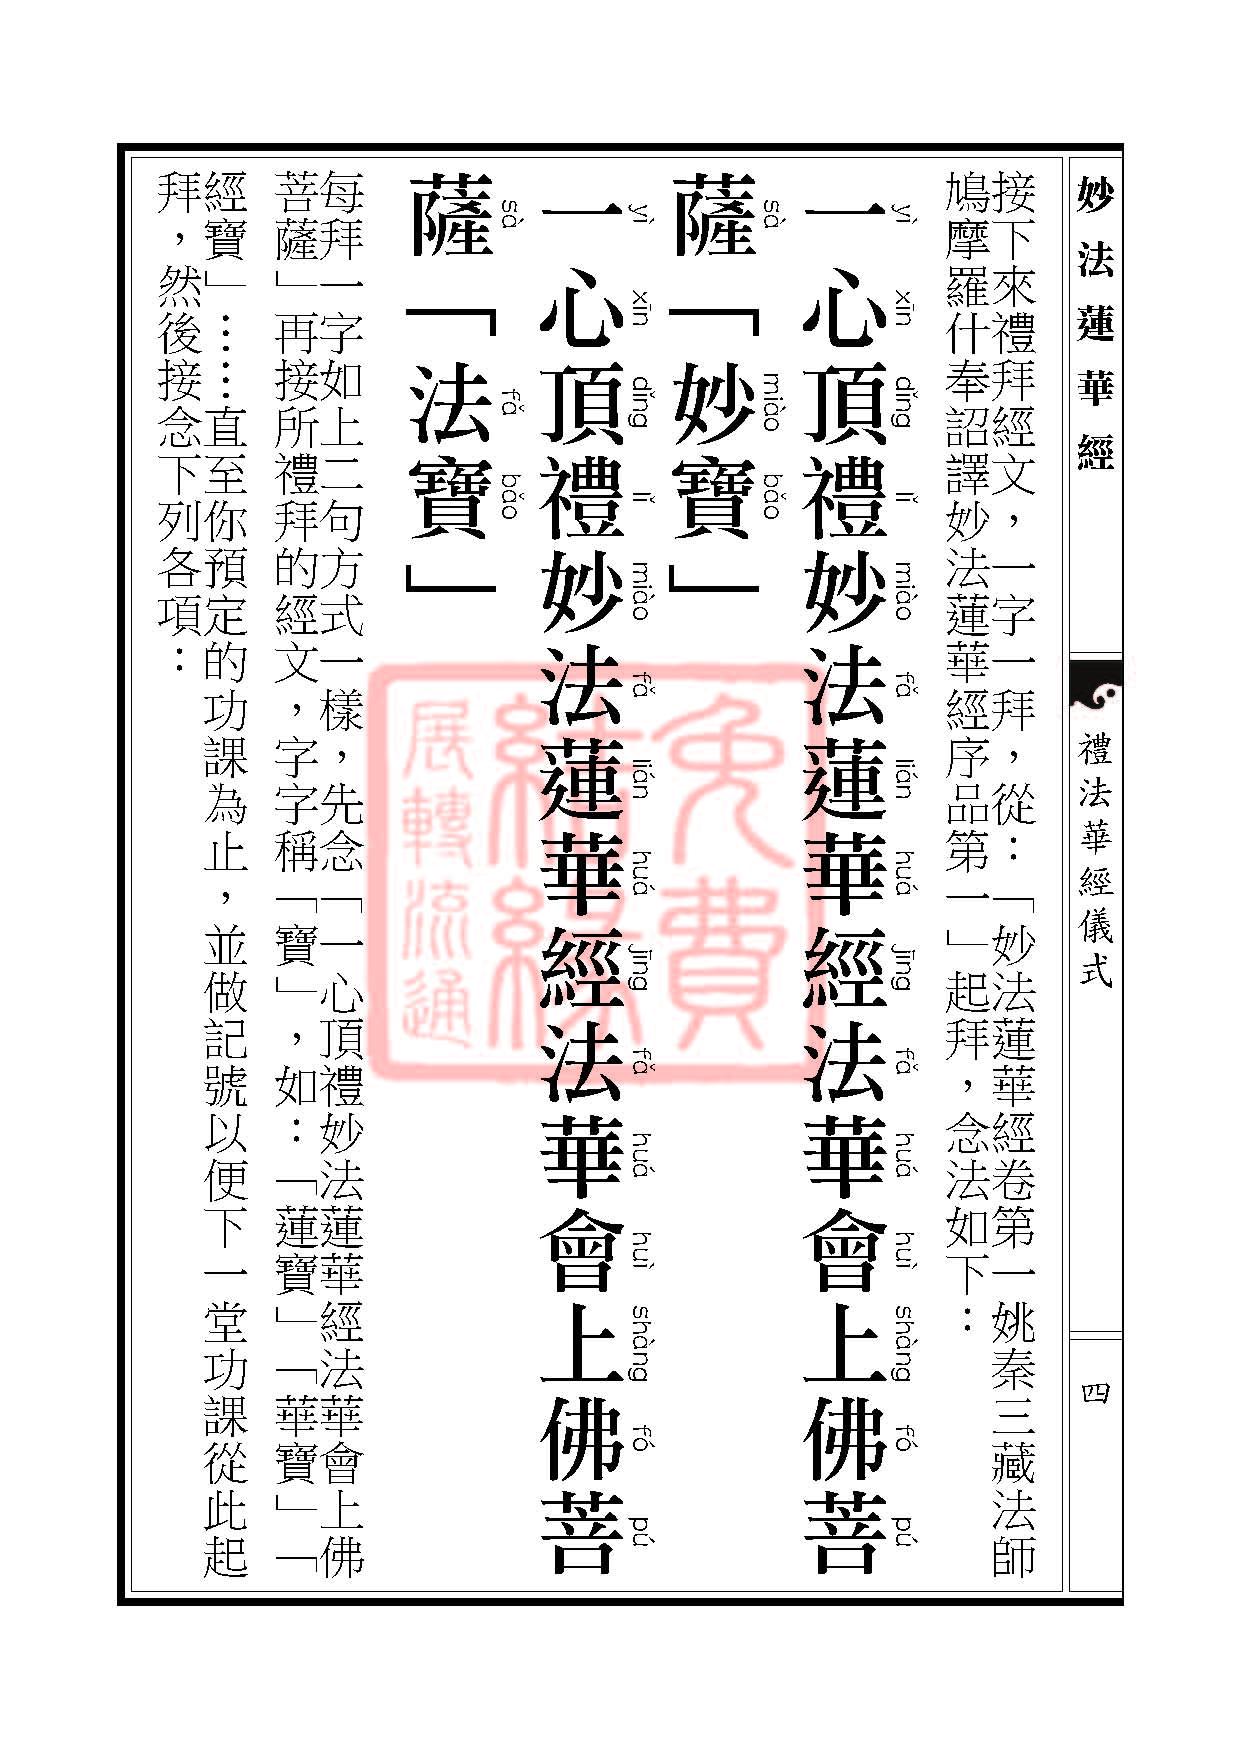 Book_FHJ_HK-A6-PY_Web_页面_004.jpg